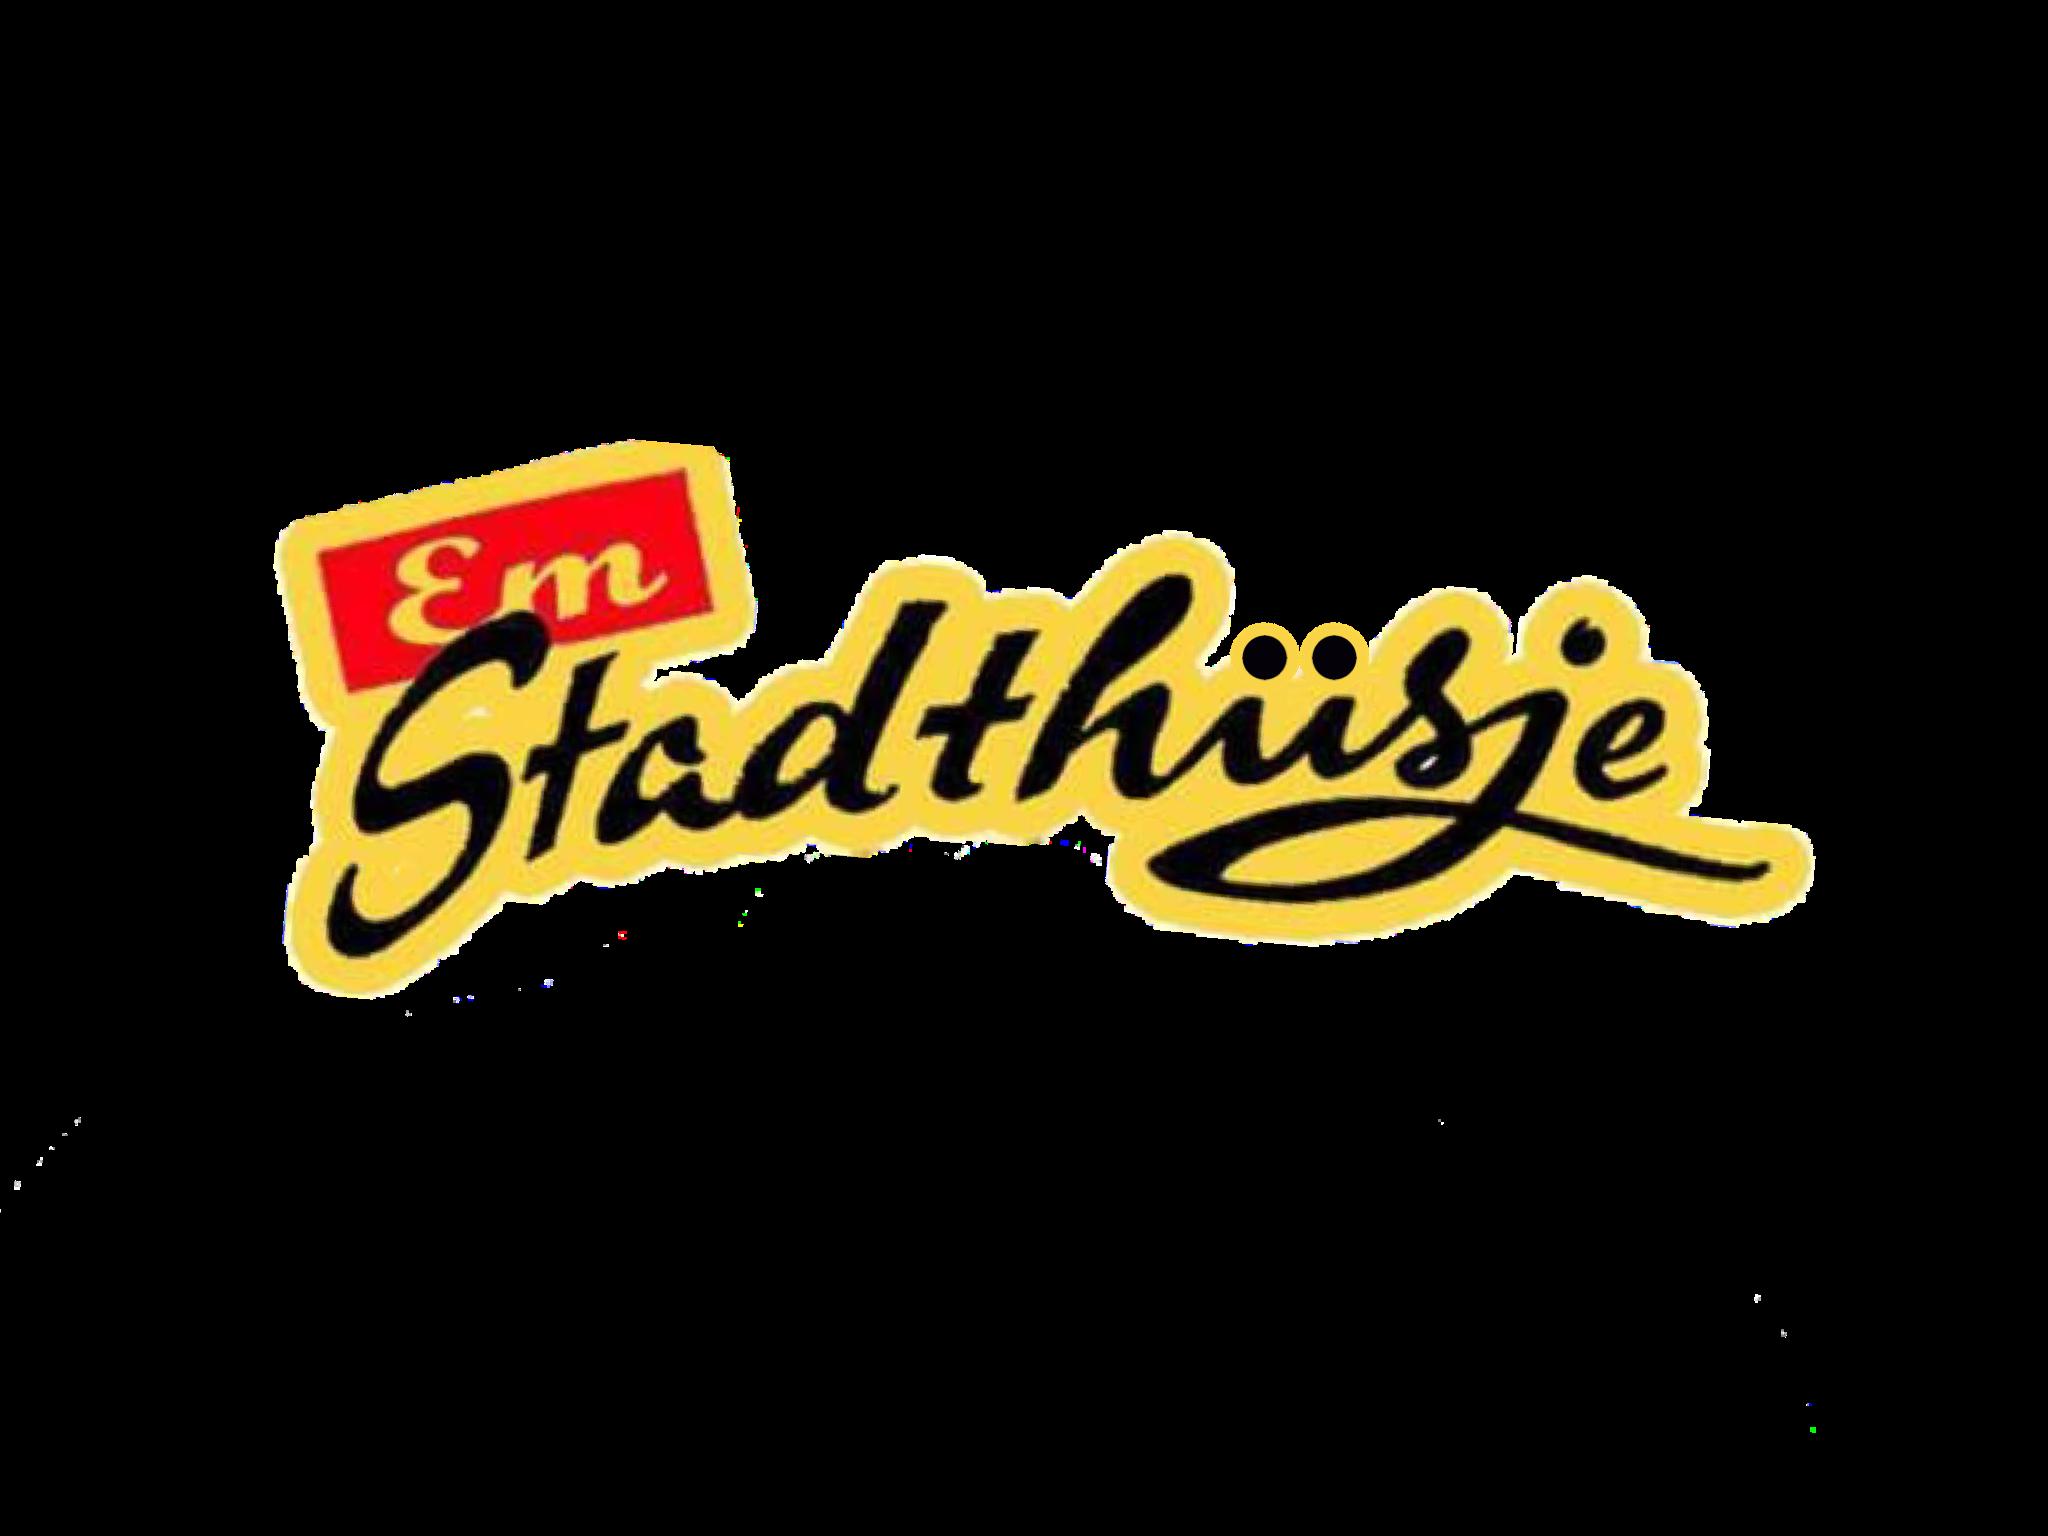 Gaststätte Em Stadthüsje